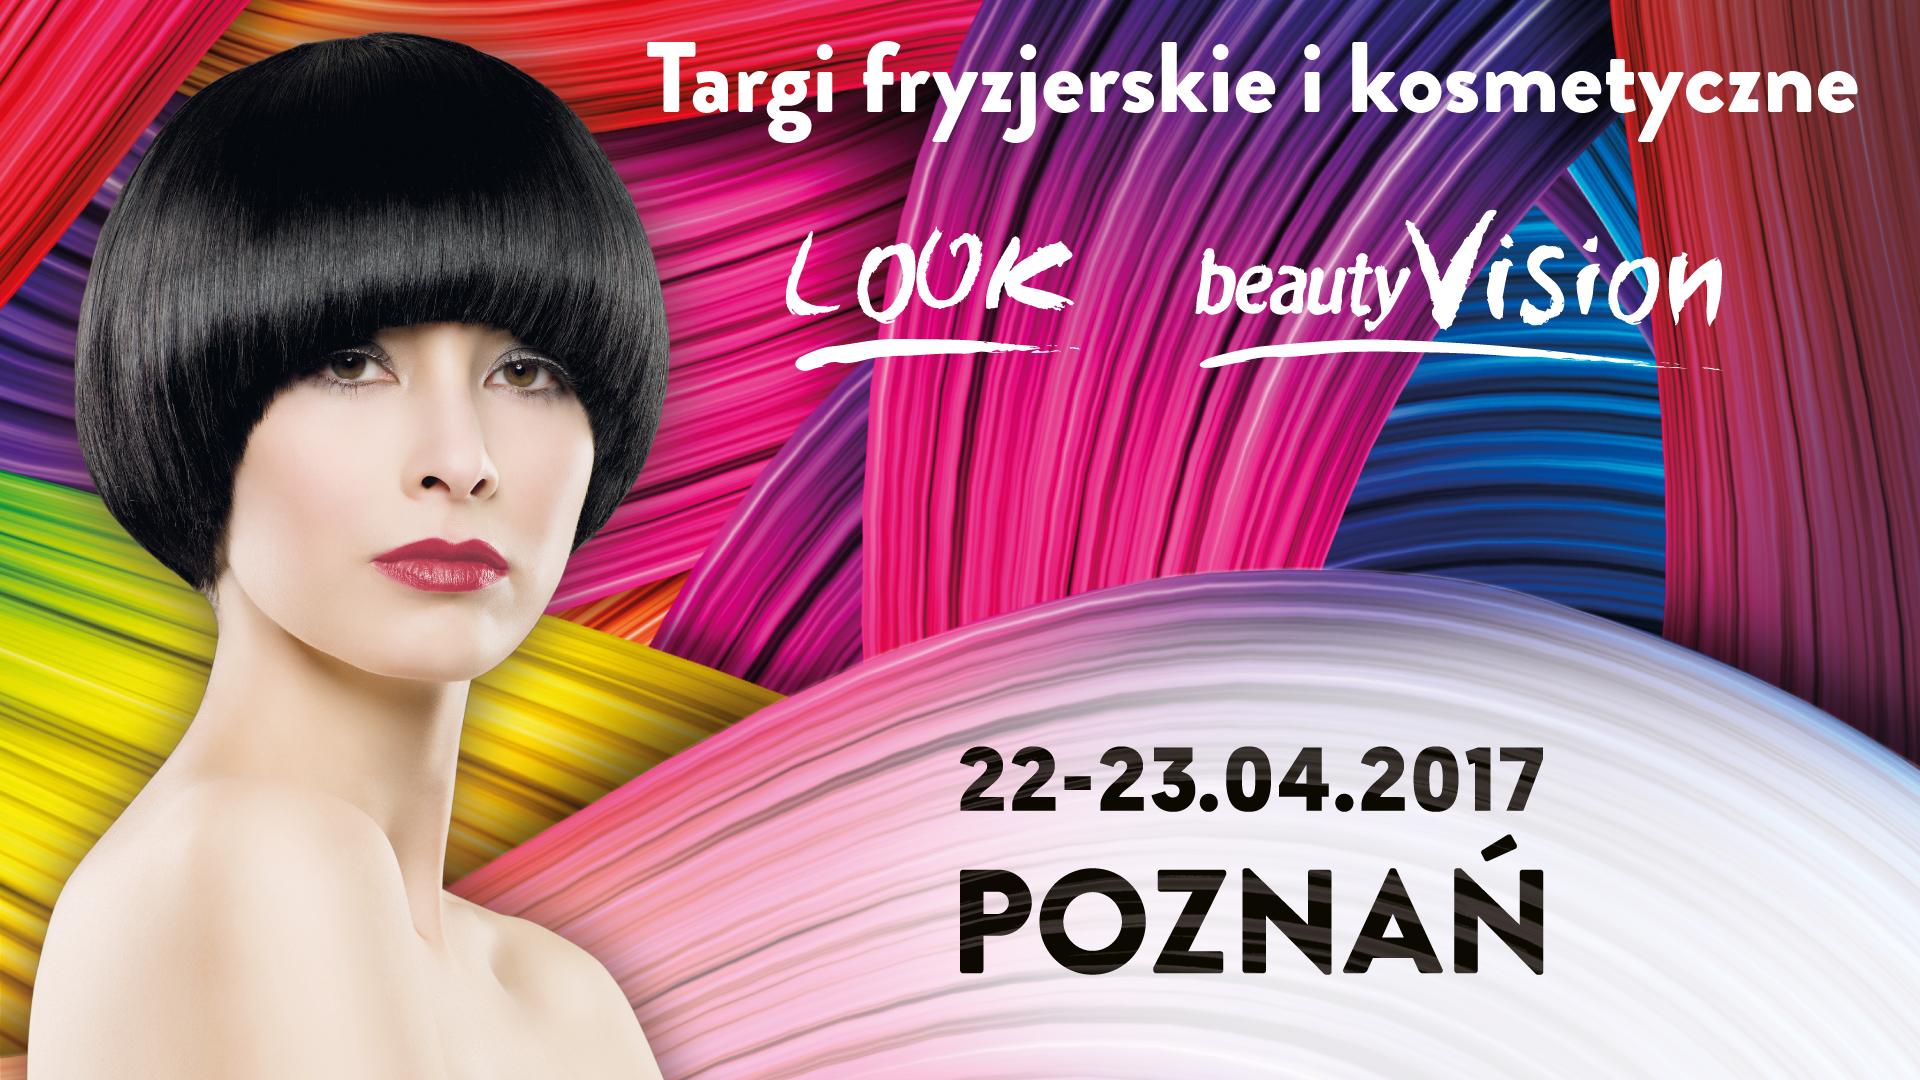 Targi Look i Beauty Vision w Poznaniu